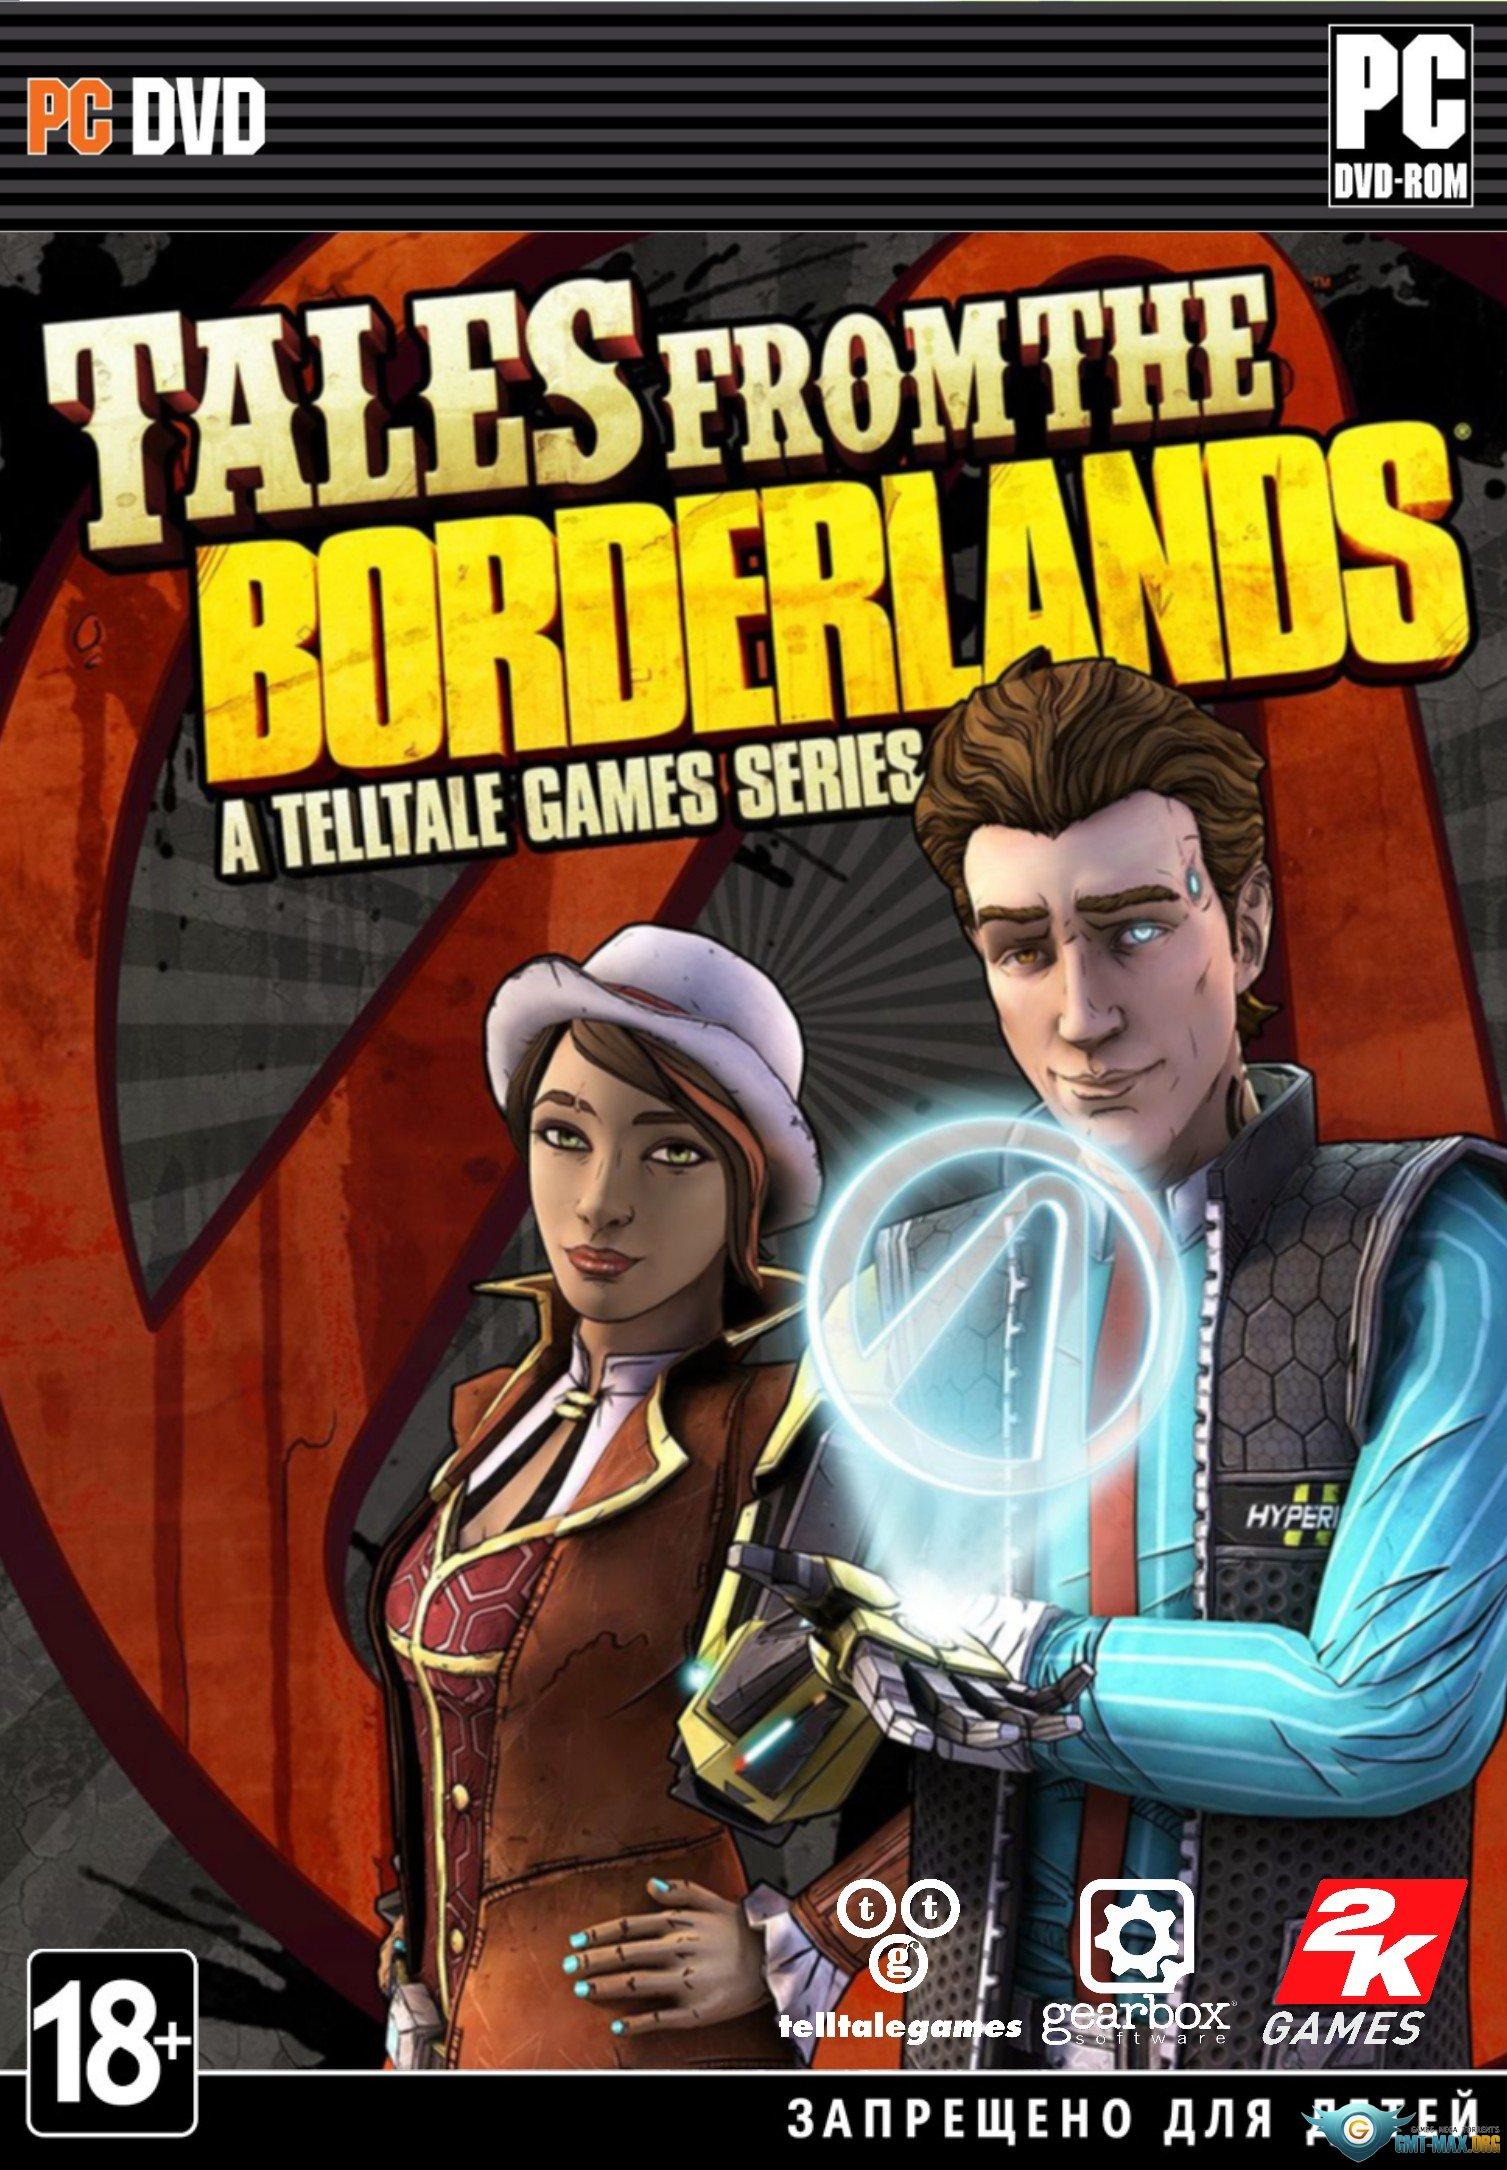 Borderlands 2 on Steam - store.steampowered.com